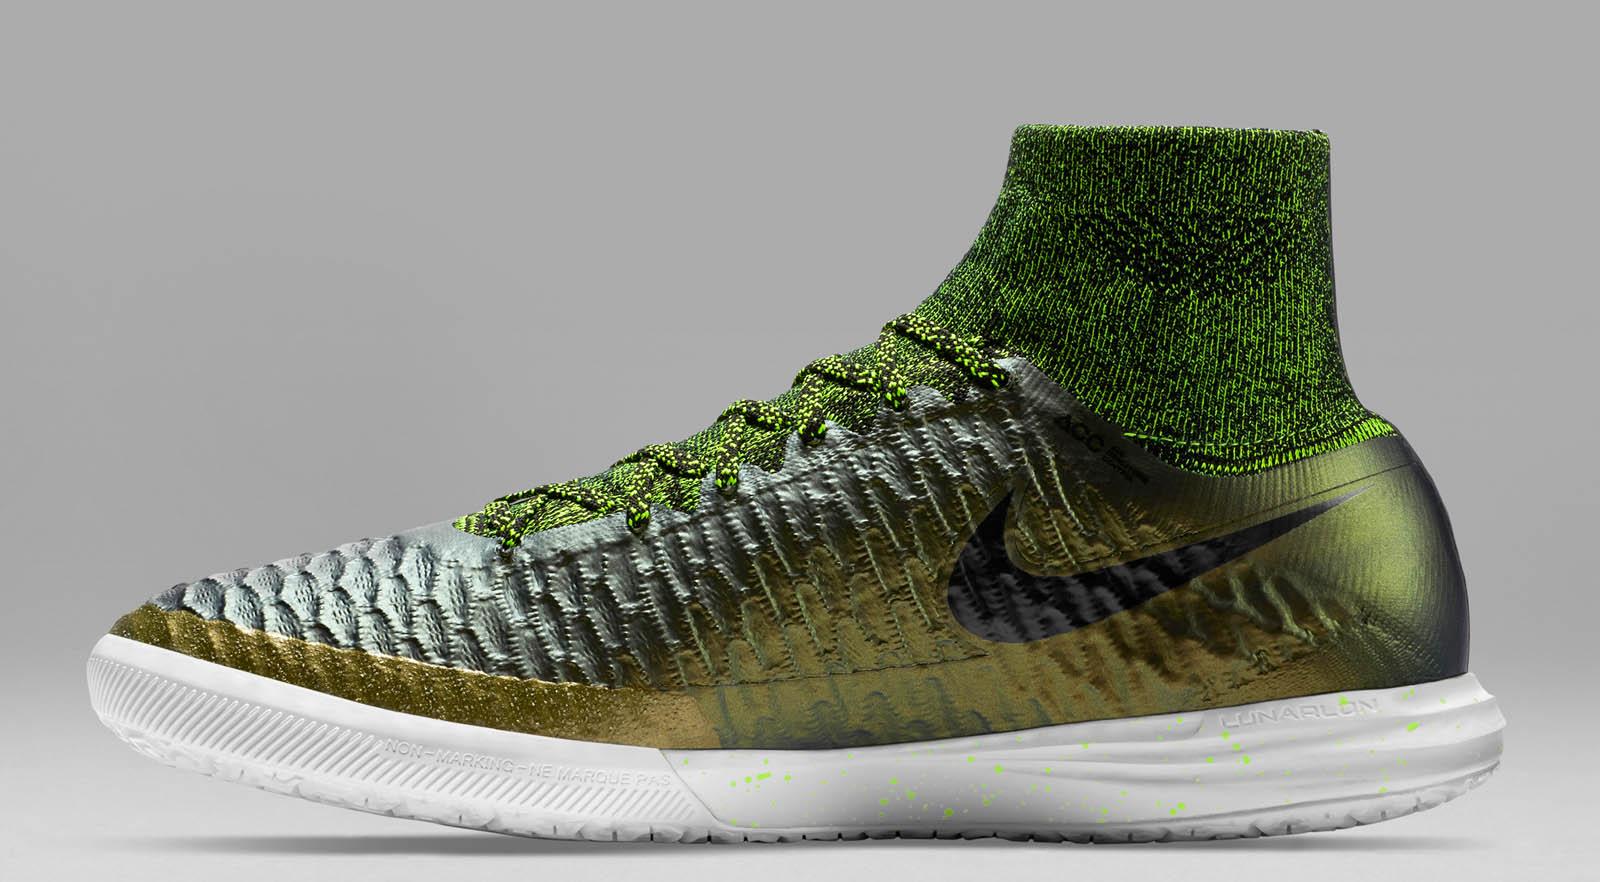 Nike CI1518001 Lebron 16 Watch The Throne Mens Basketball